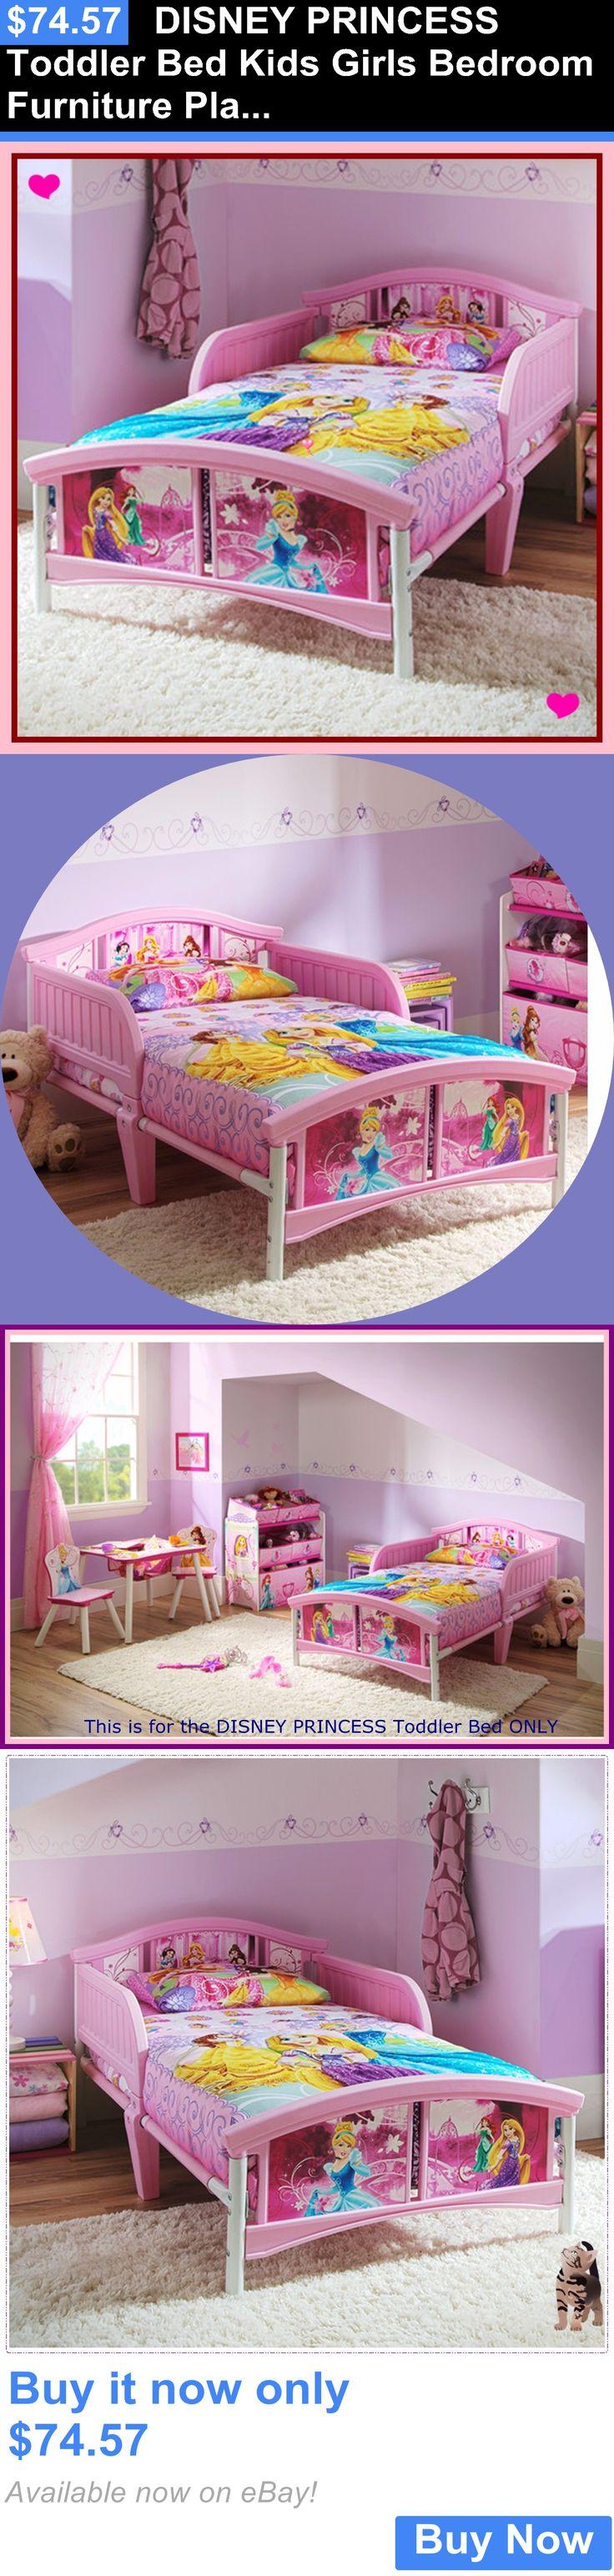 Kids at Home: Disney Princess Toddler Bed Kids Girls Bedroom Furniture Plastic Steel Frame New BUY IT NOW ONLY: $74.57